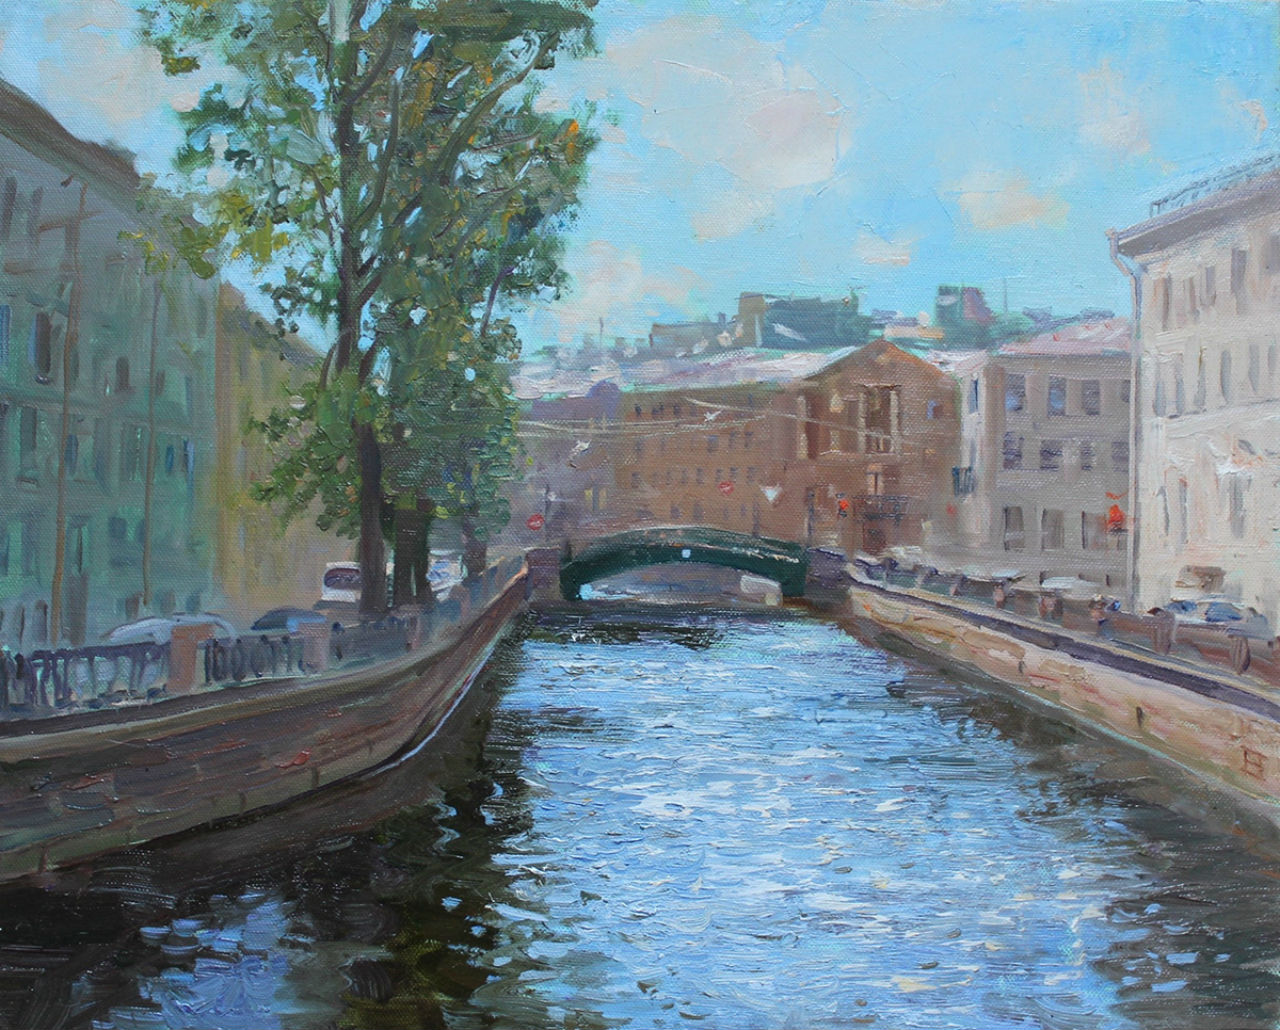 14-Канал Грибоедова.jpg